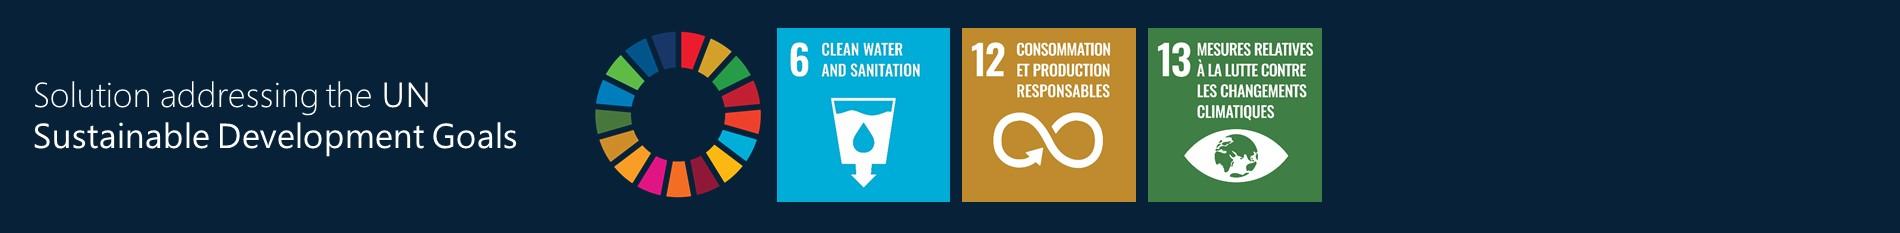 Sustainable Development Goals UN GIS KIS Altereo